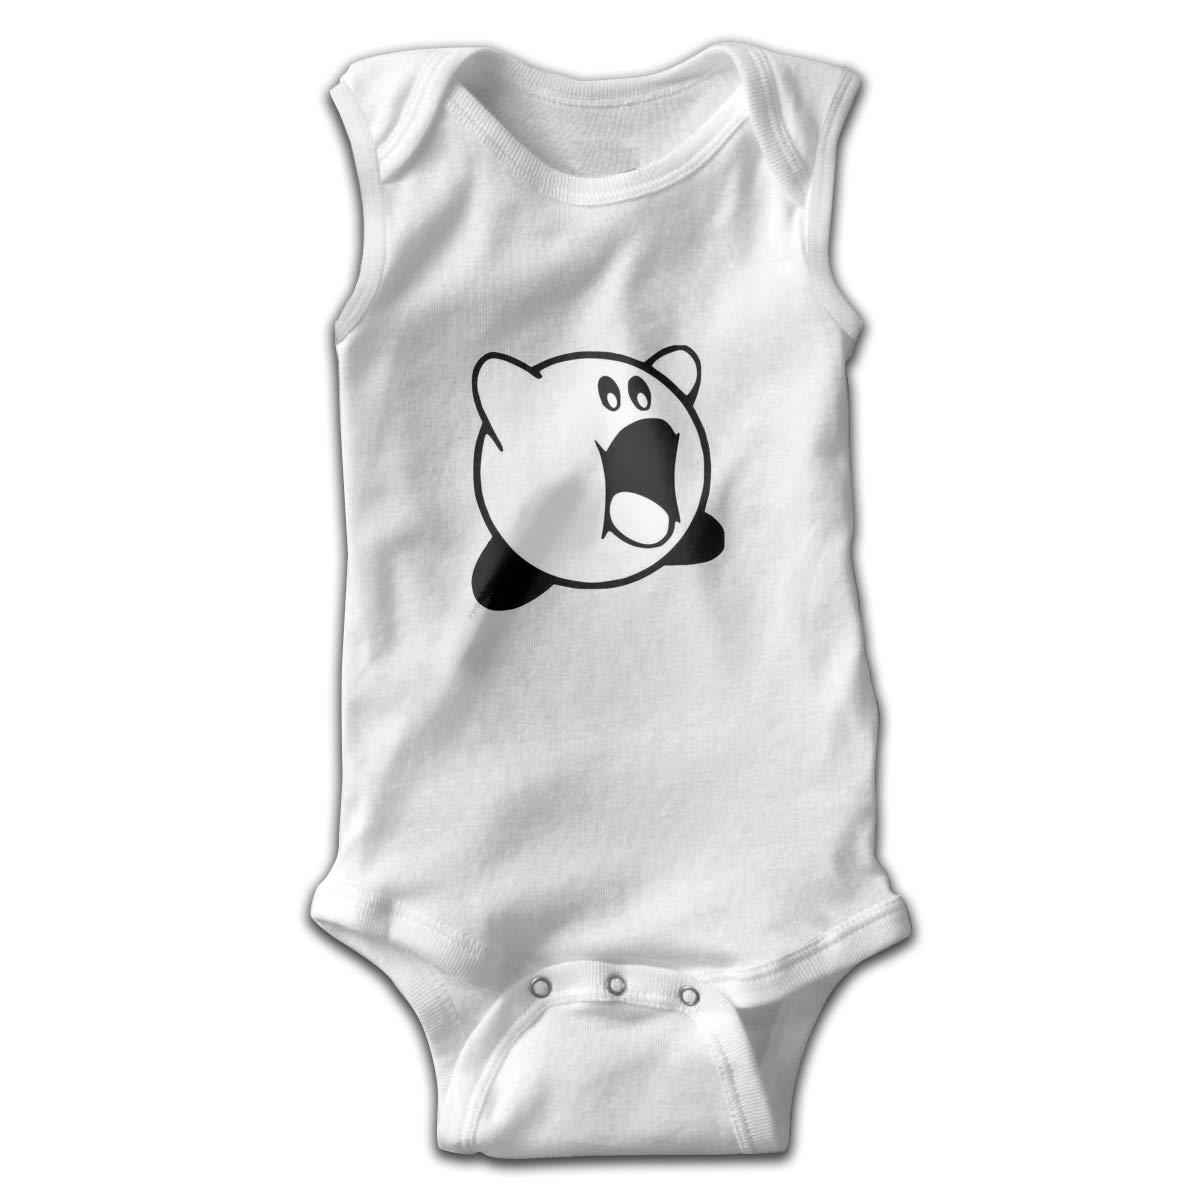 Dfenere Eating Newborn Baby No Sleeve Bodysuit Romper Infant Summer Clothing Black